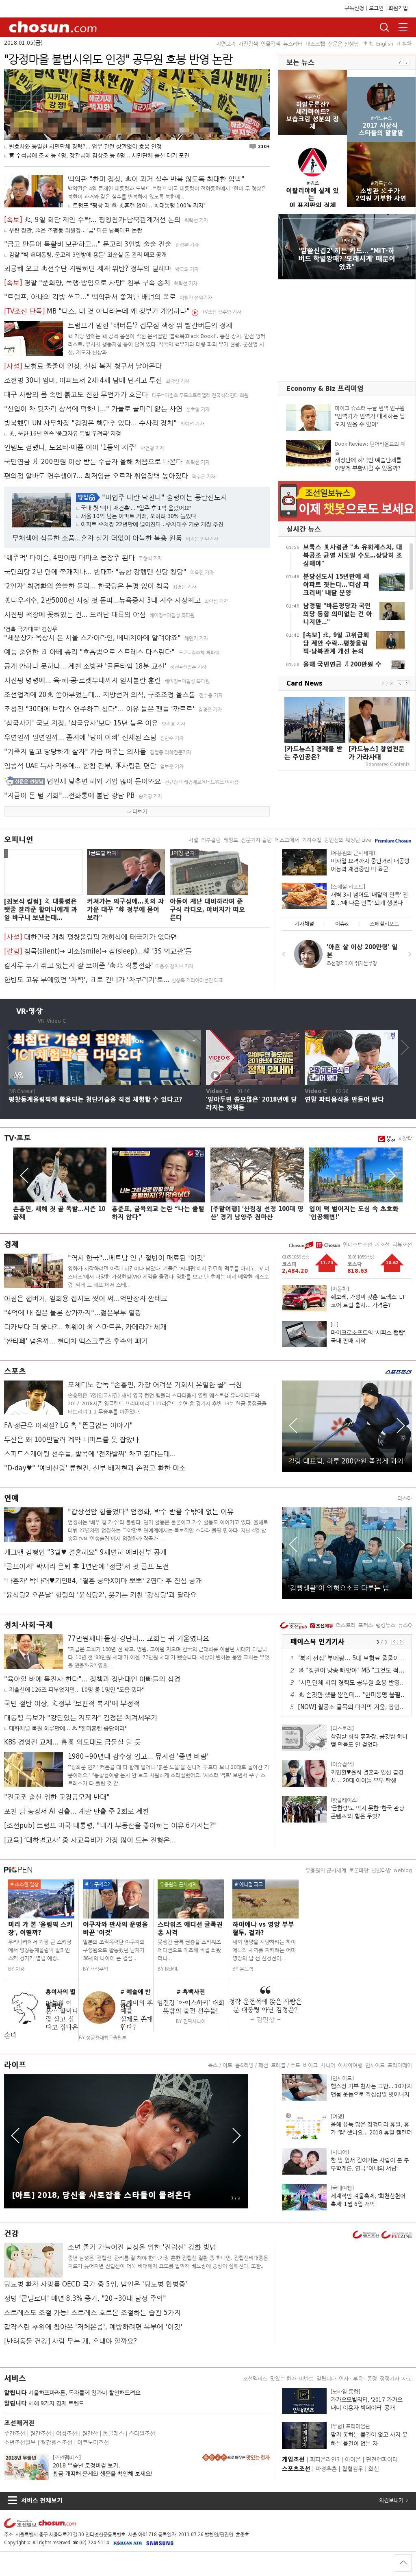 chosun.com at Friday Jan. 5, 2018, 2:01 a.m. UTC